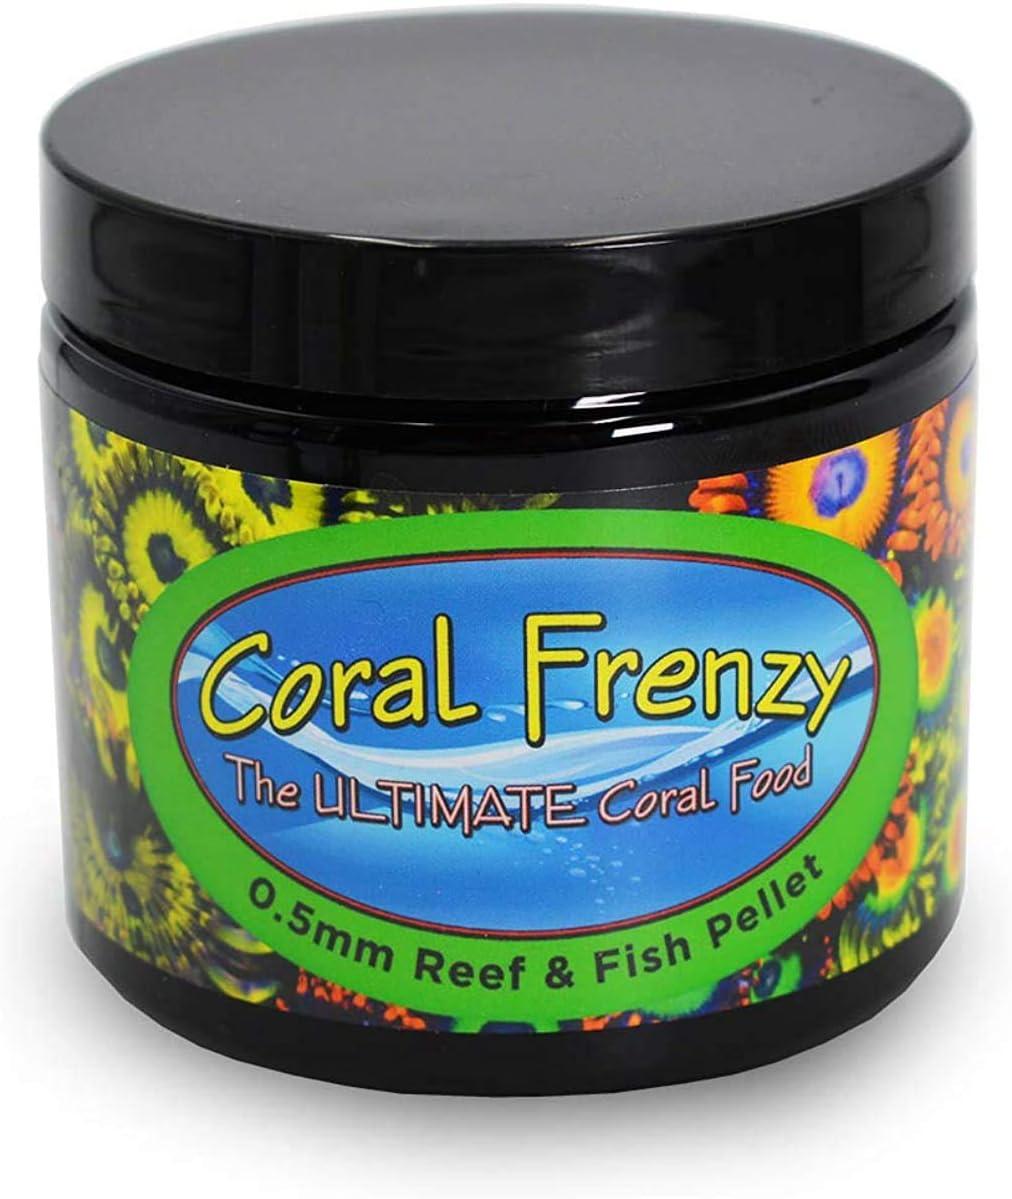 Coral Frenzy 0.5 mm Reef & Fish Pellet